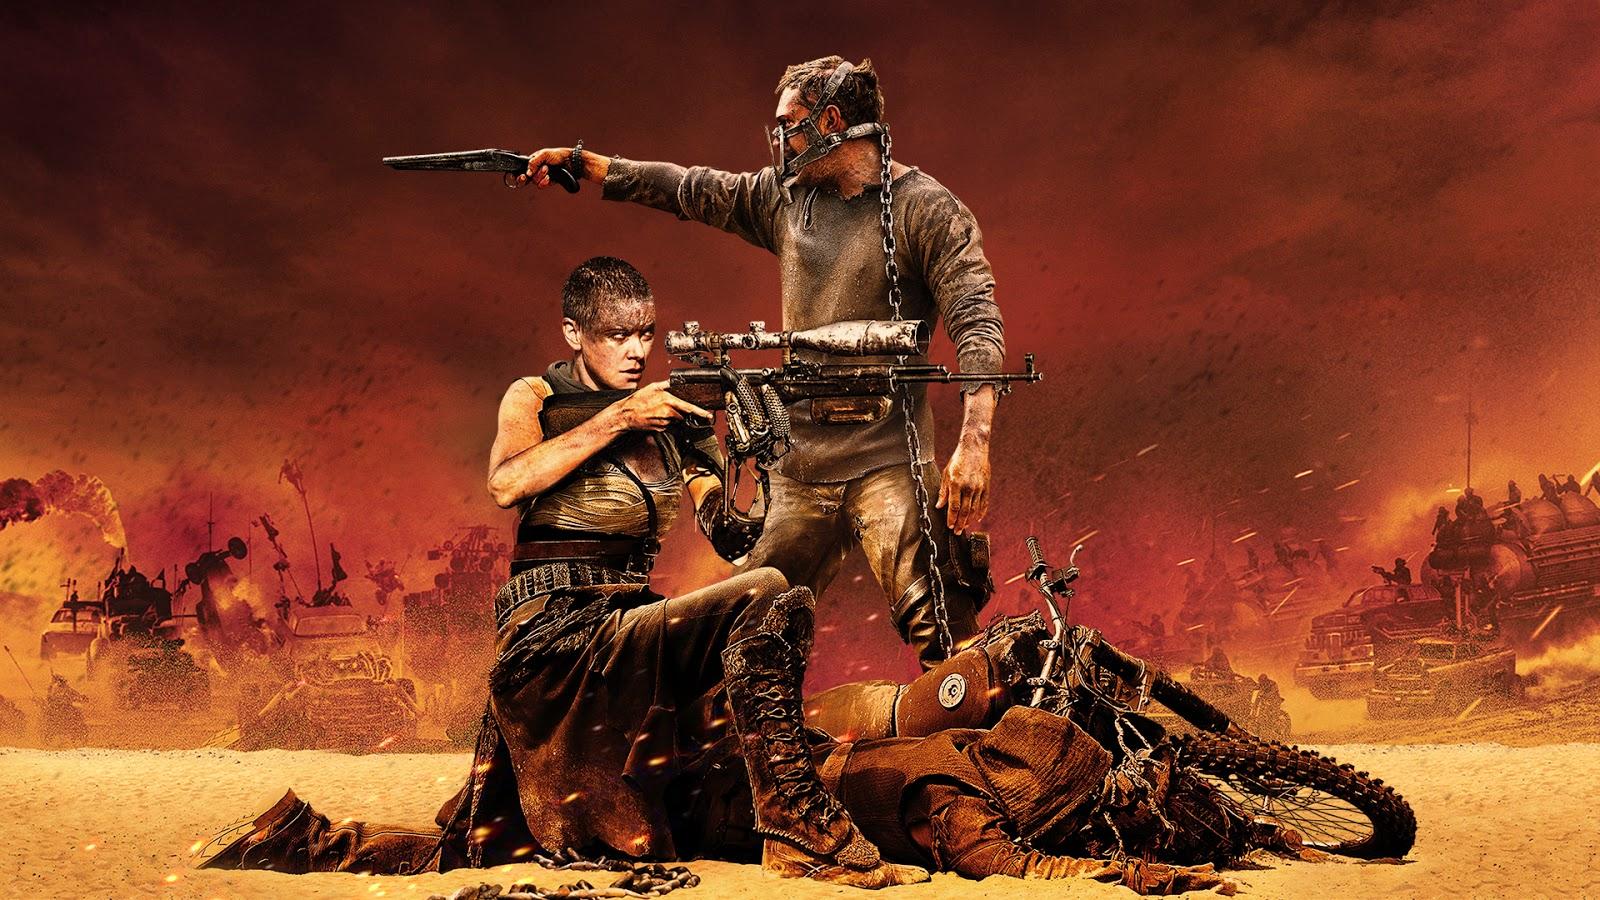 Wallpaper For Pc Mad Max Fury Road Wallpaper Mad Max Fury Road 1600x900